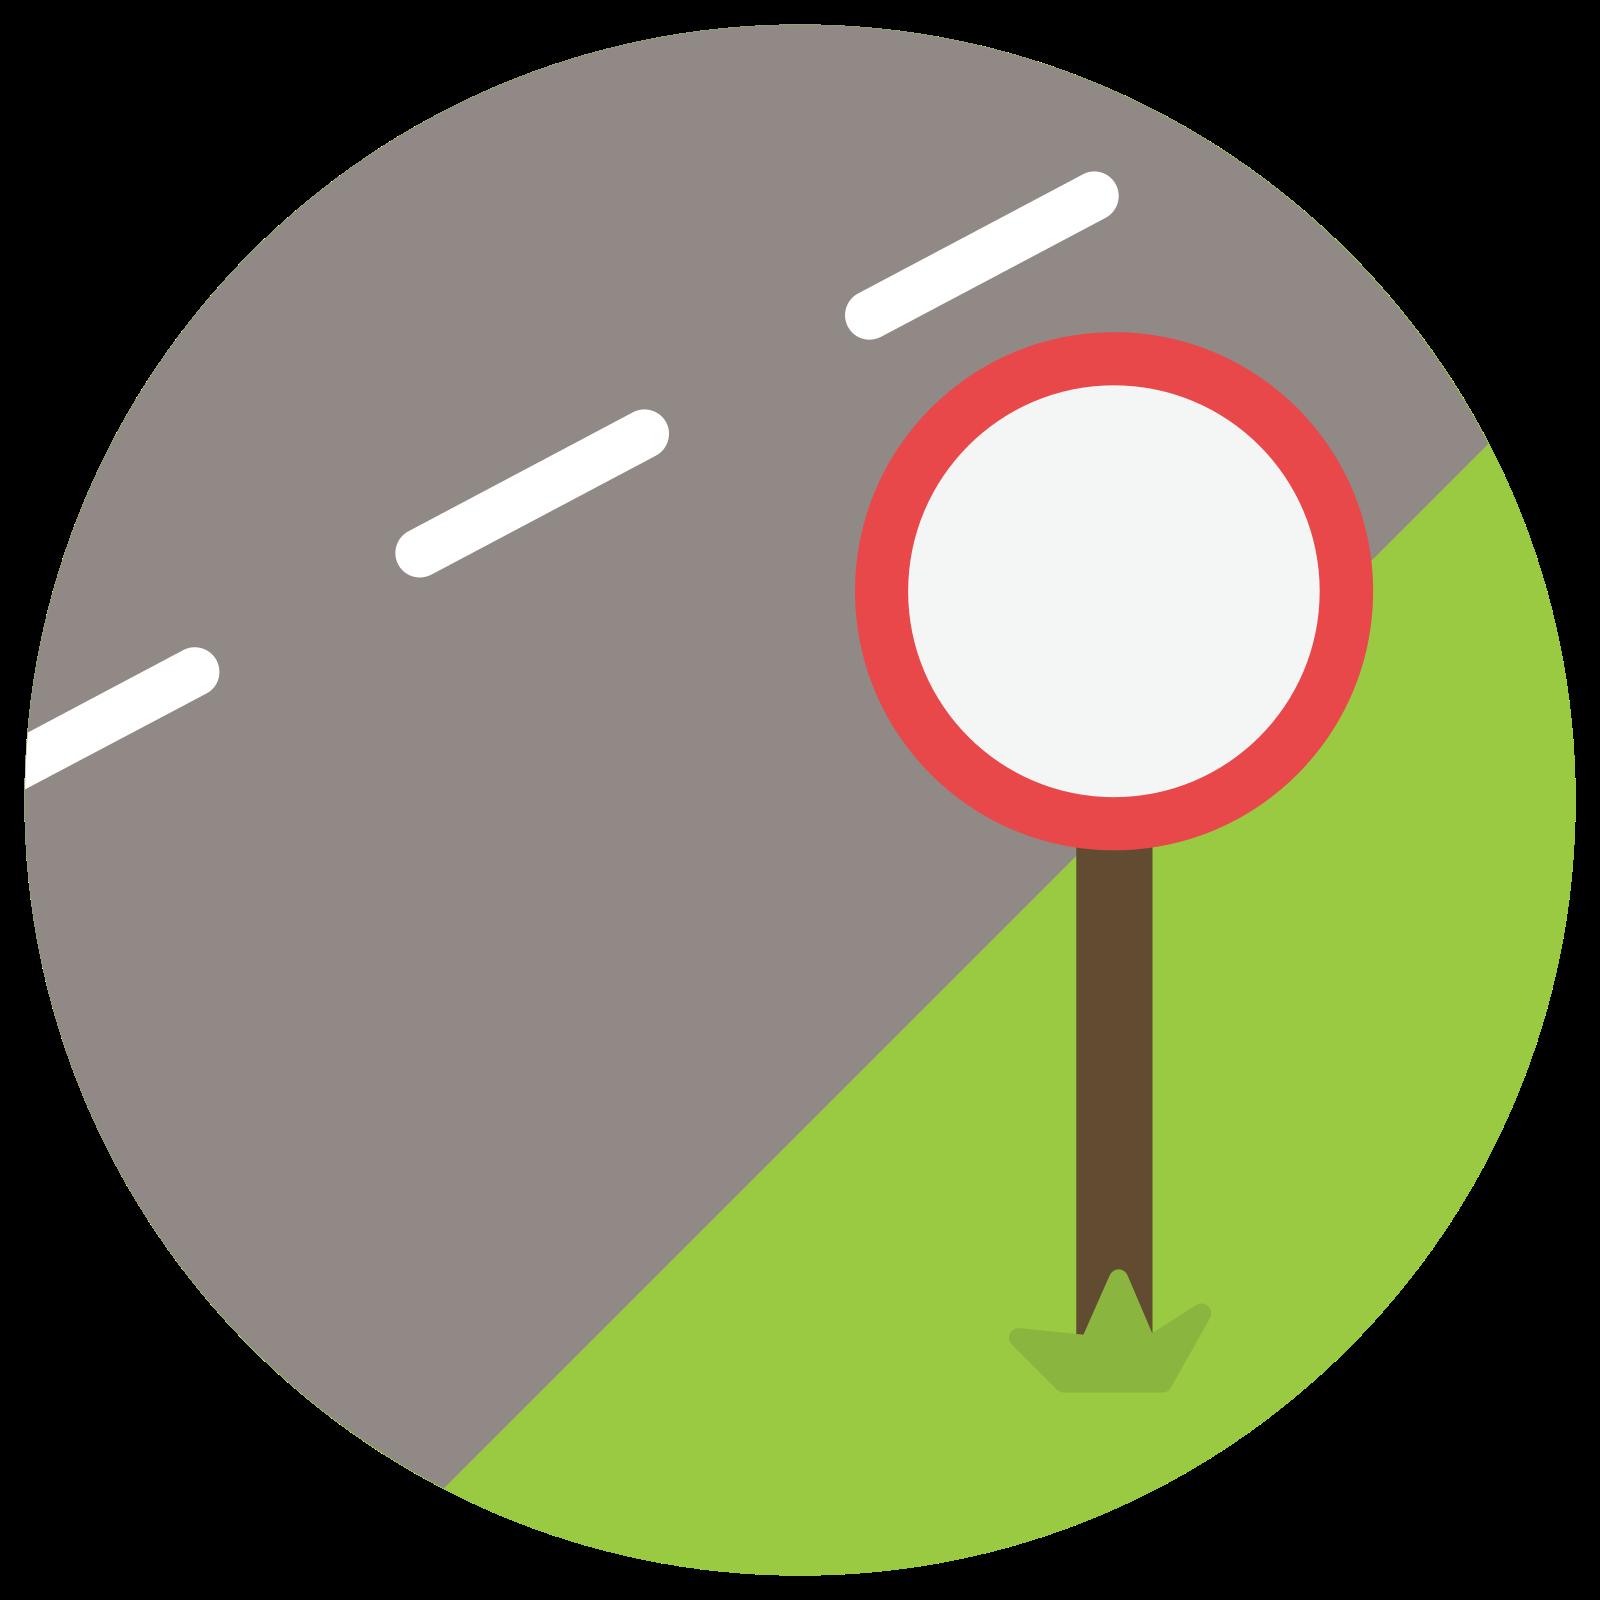 Road Closed icon